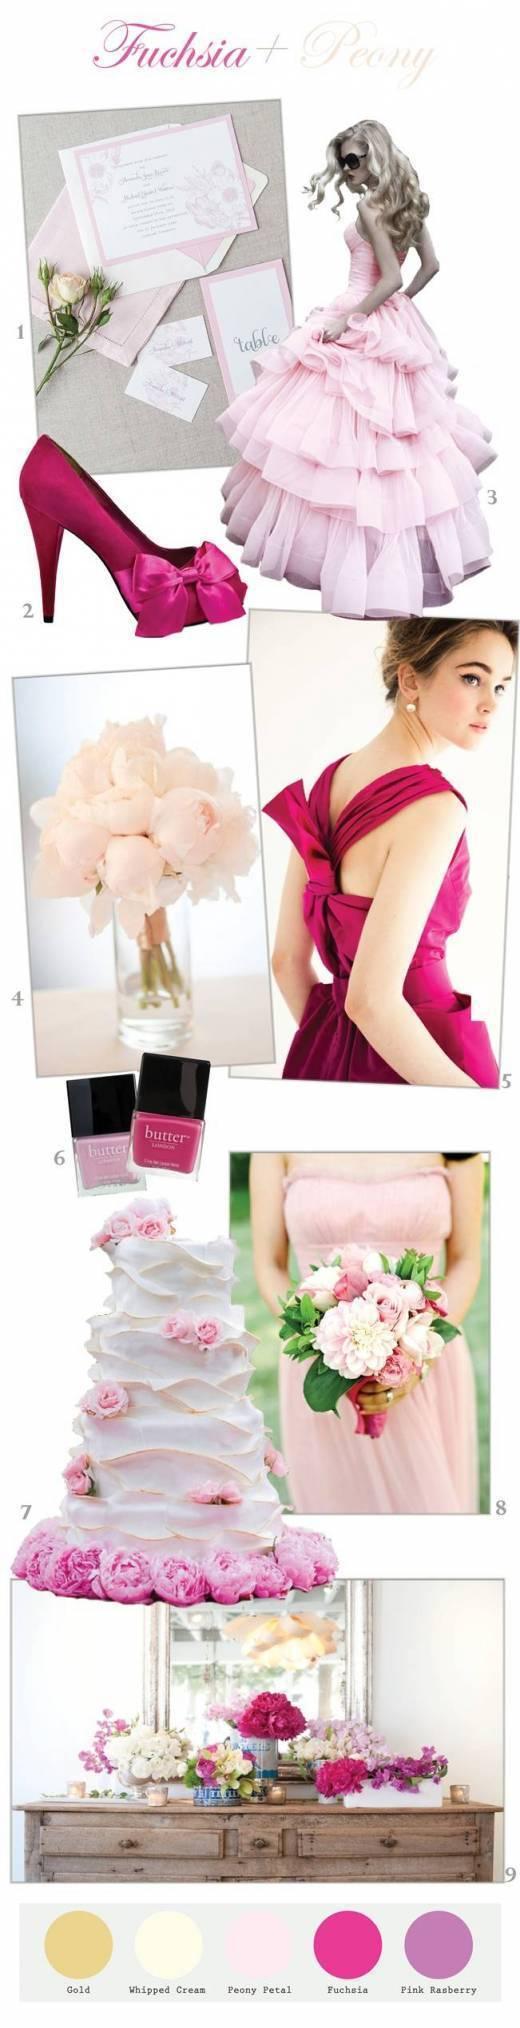 Fuchsia + Peony Pink Wedding Inspiration